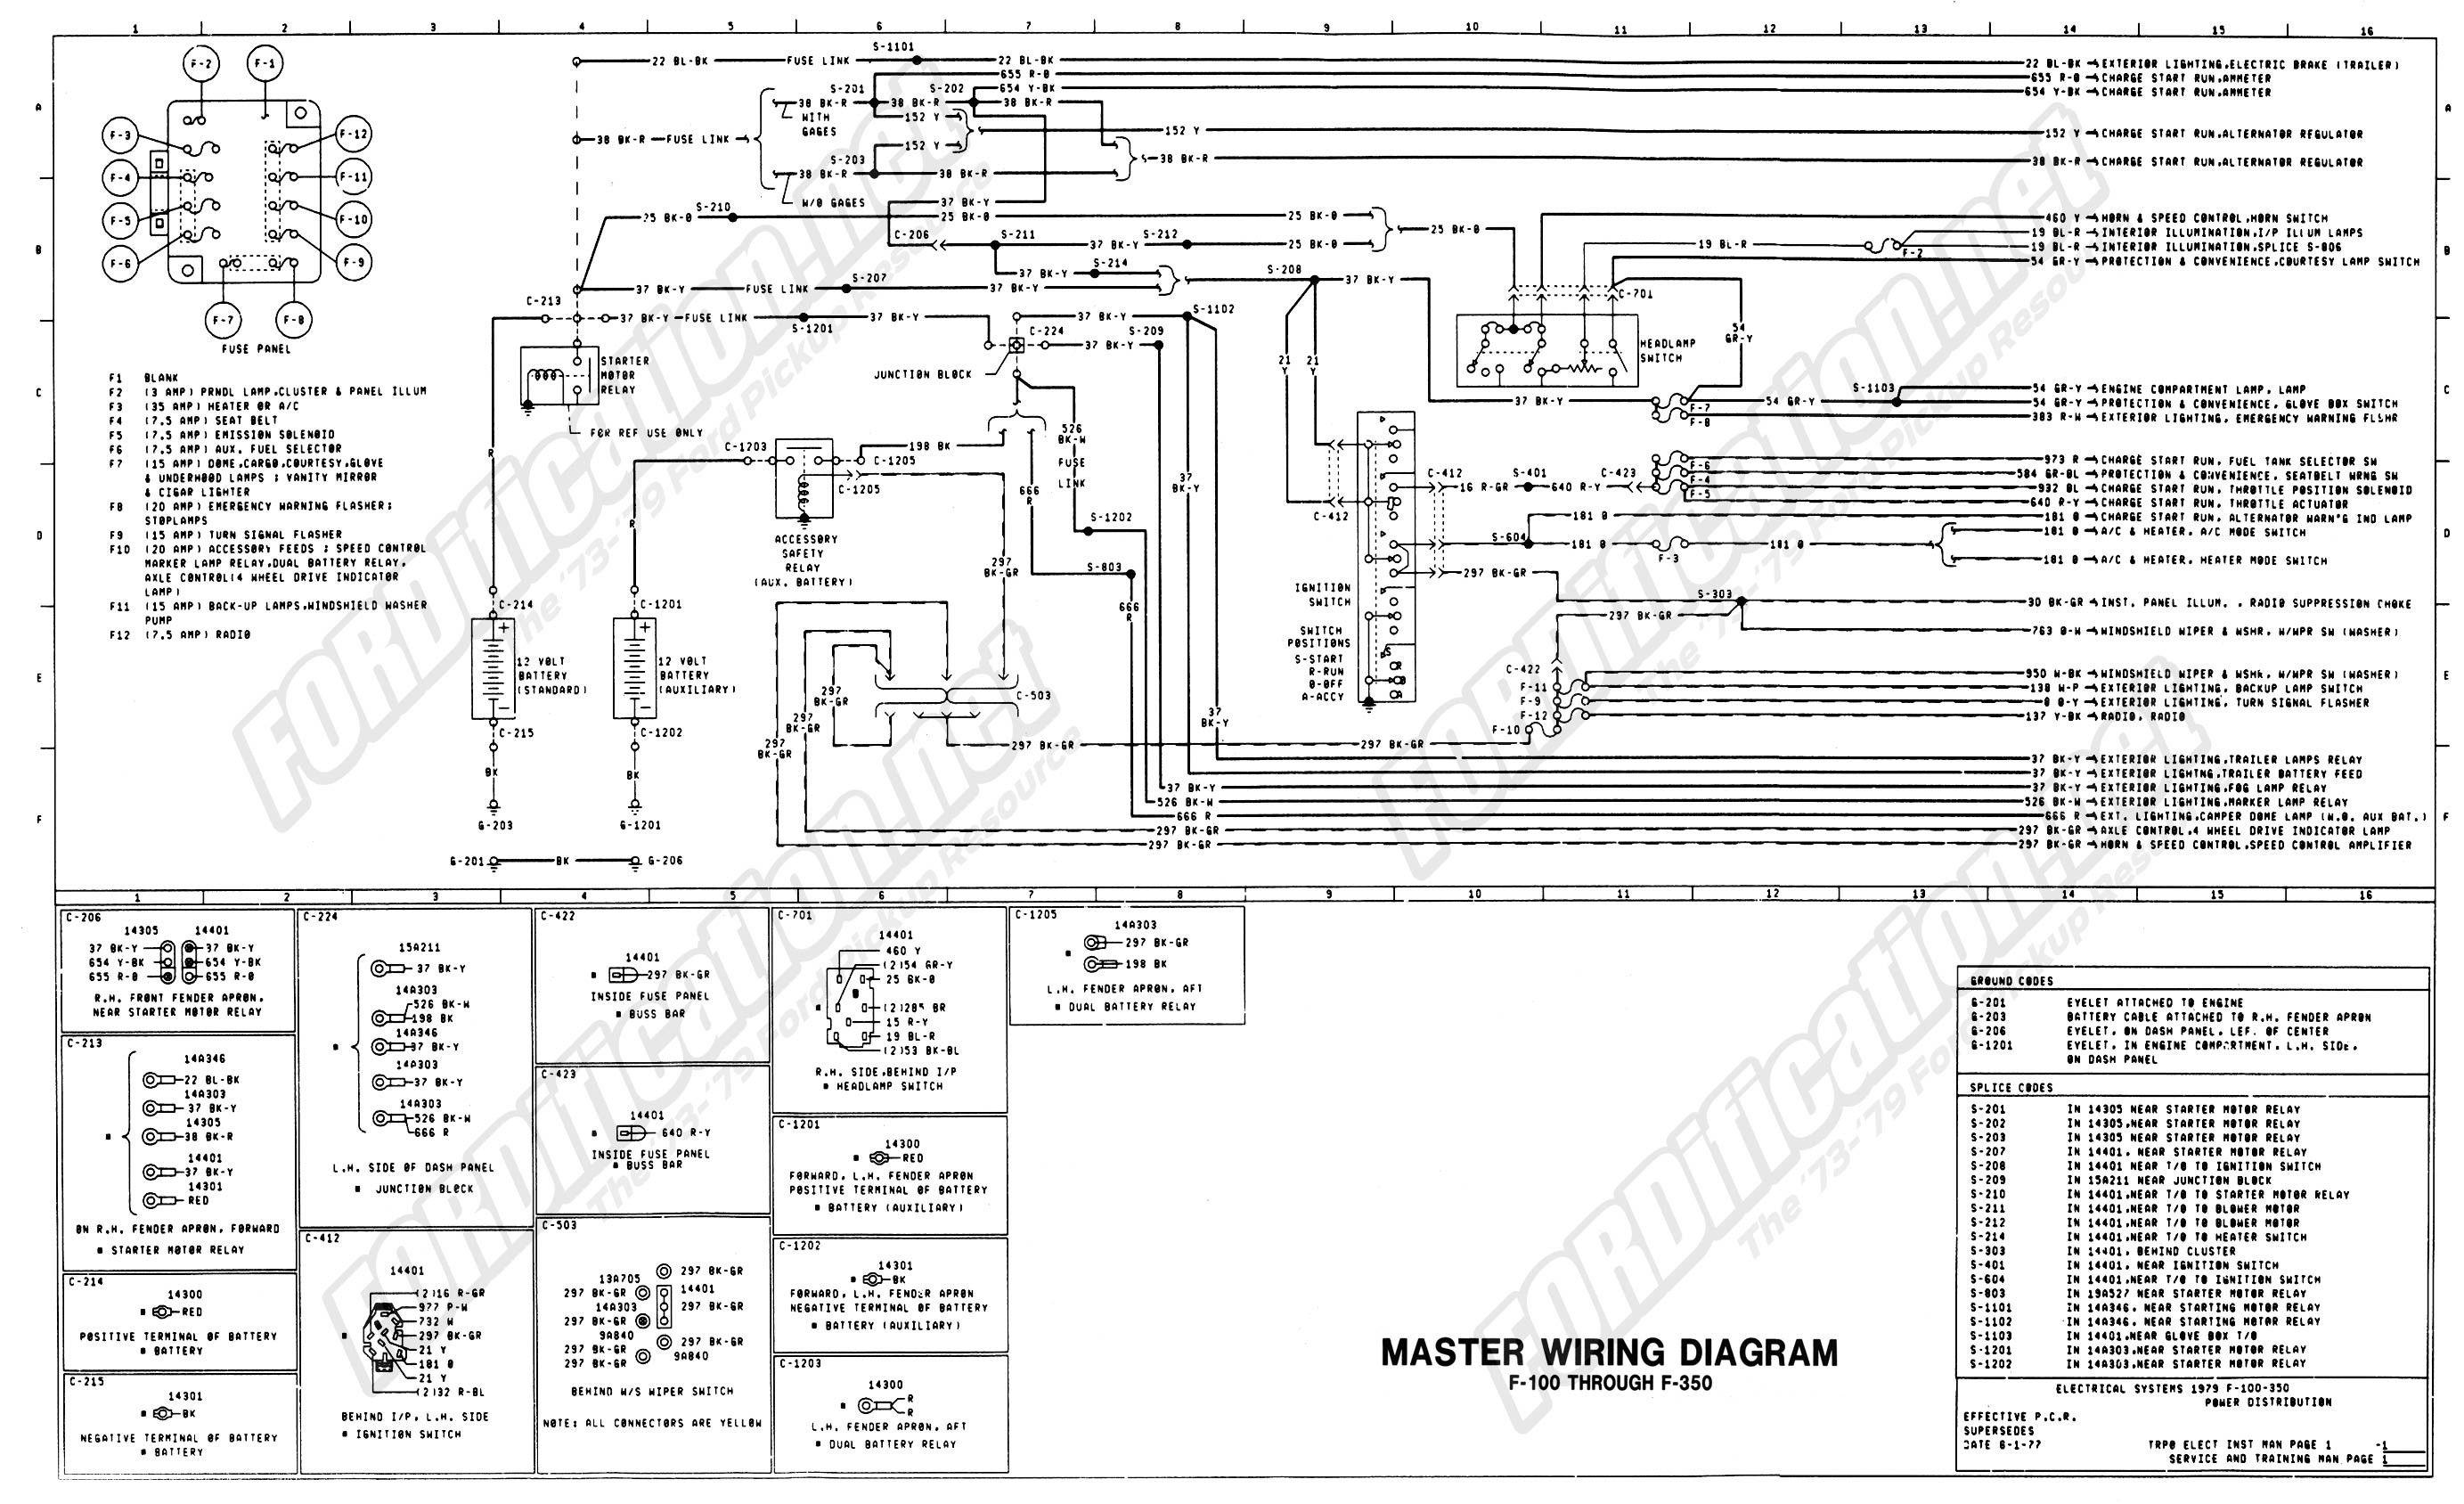 1976 Chevy Truck Wiring Diagram In 2021 Sterling Trucks Diagram Wire